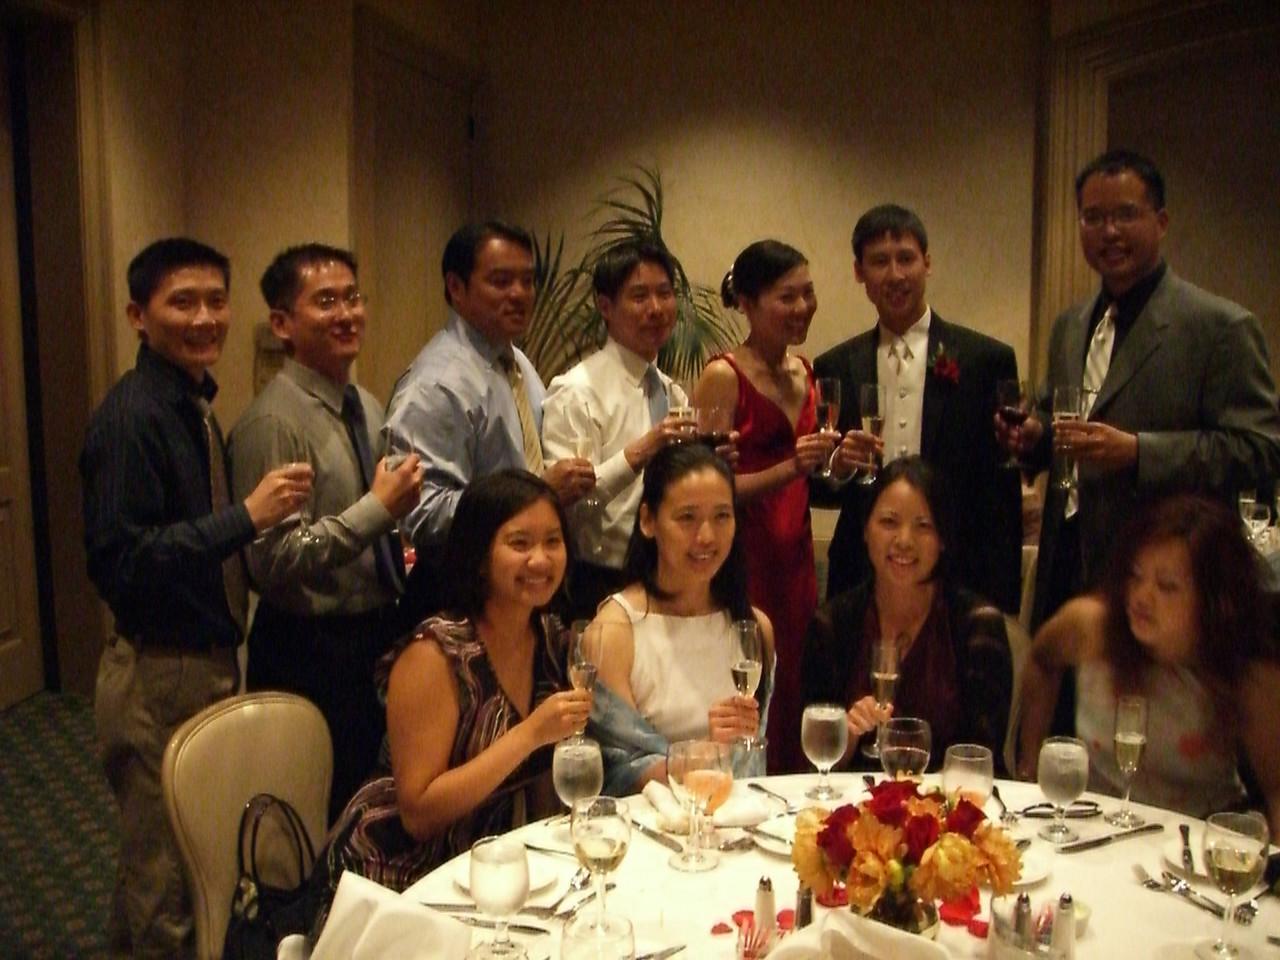 Table pic with bride & groom - EFC-Harvest Berkeley older classes 1